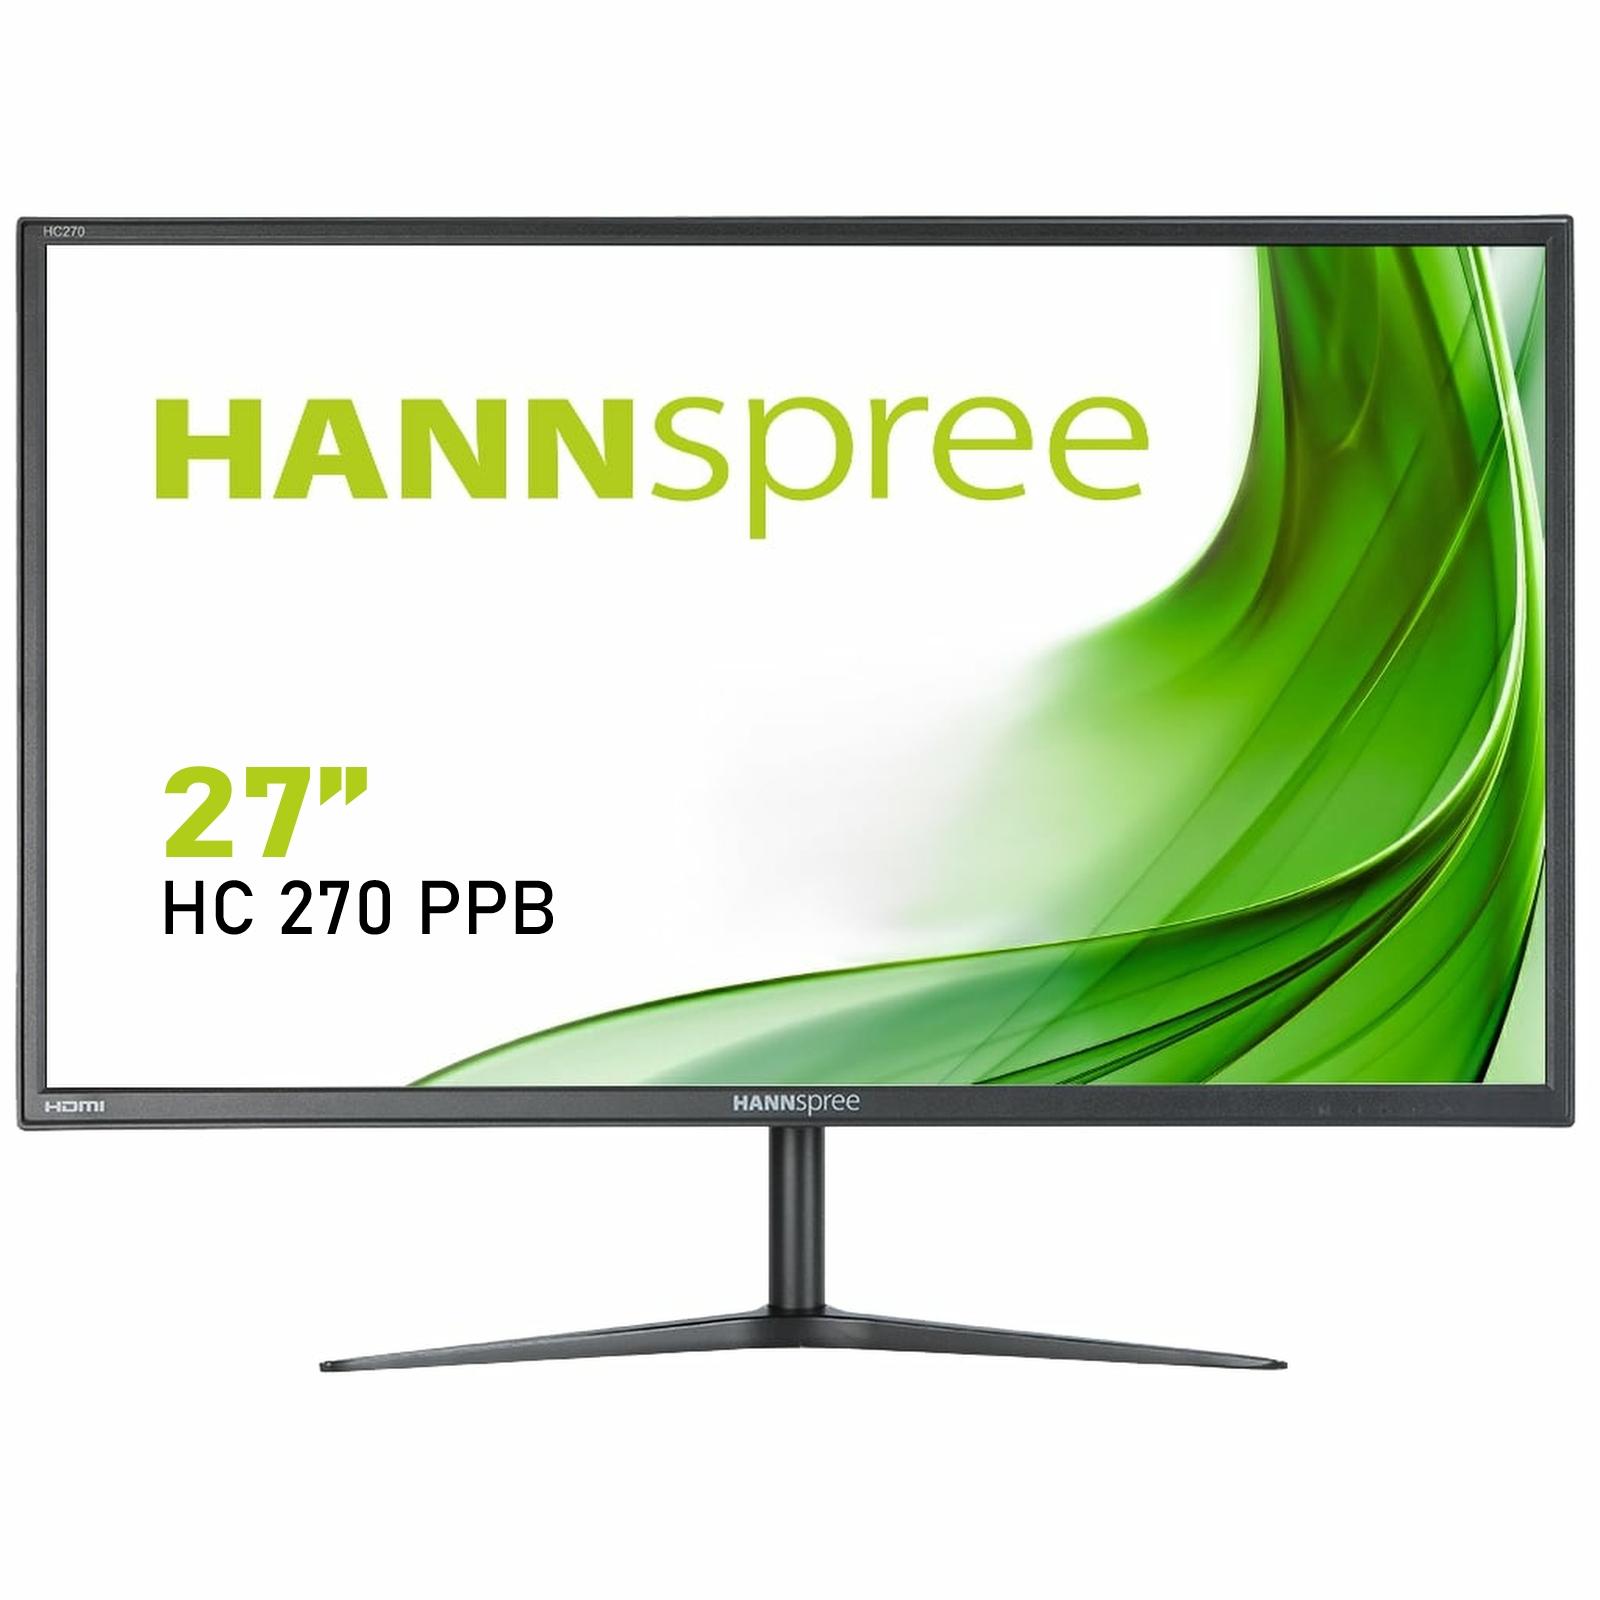 "Hannspree HC 270 PPB 68.6 cm (27"") 1920 x 1080 pixels Full HD LED Black"